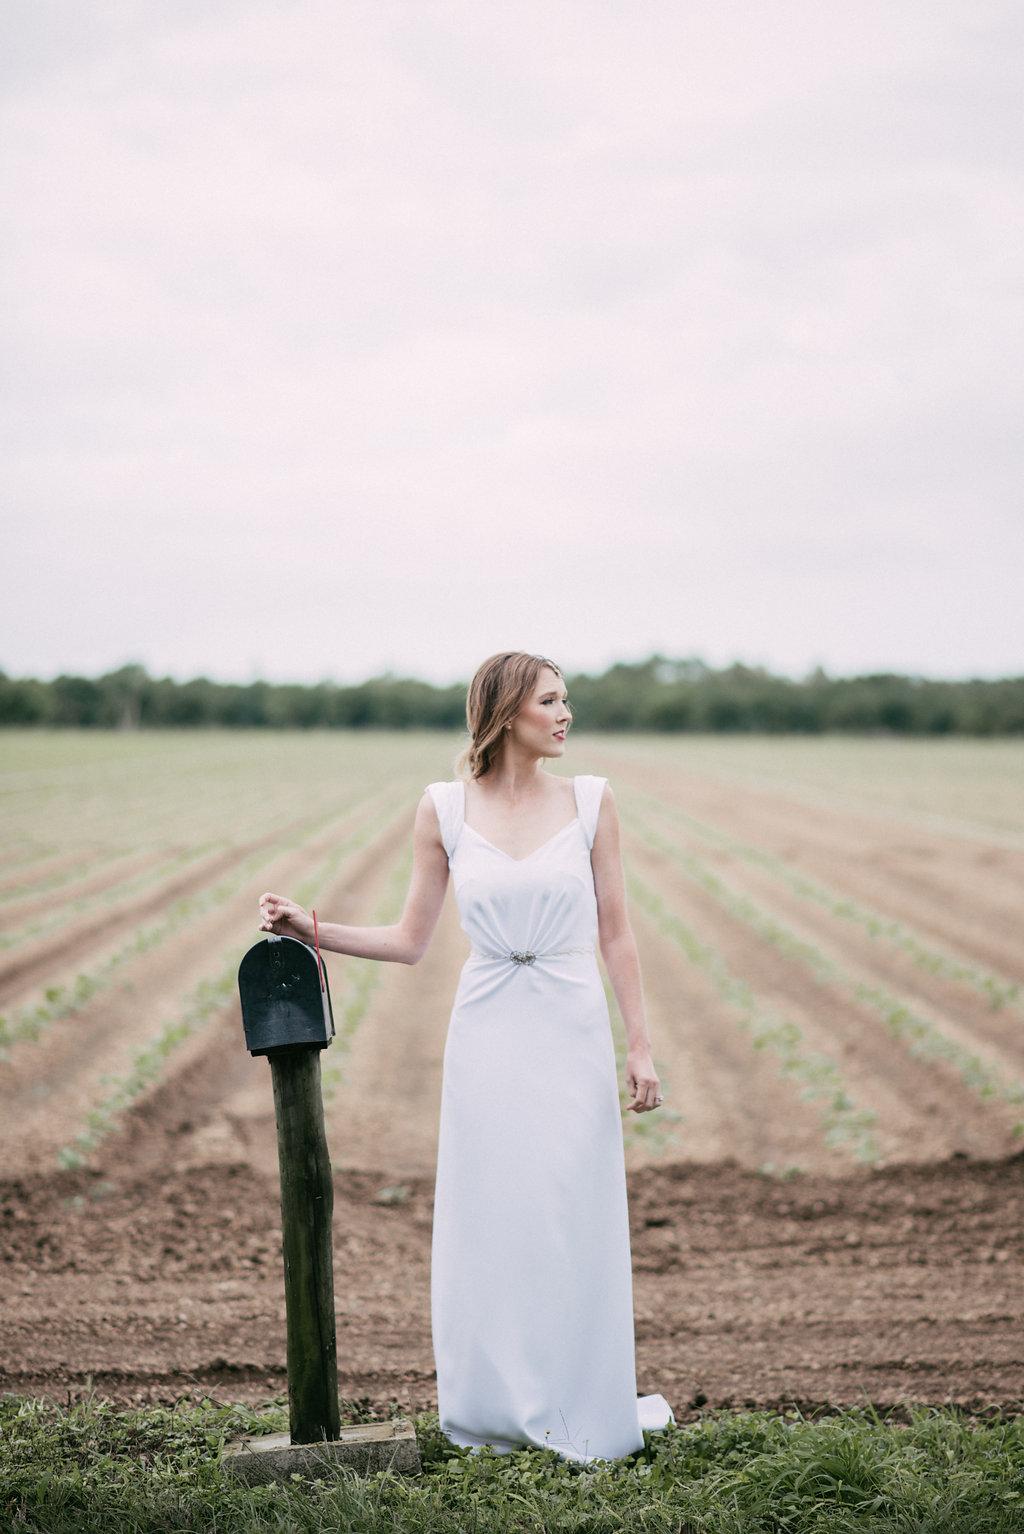 thecreativesloft_Natural_bridal_styled_shoot_The_walton_house